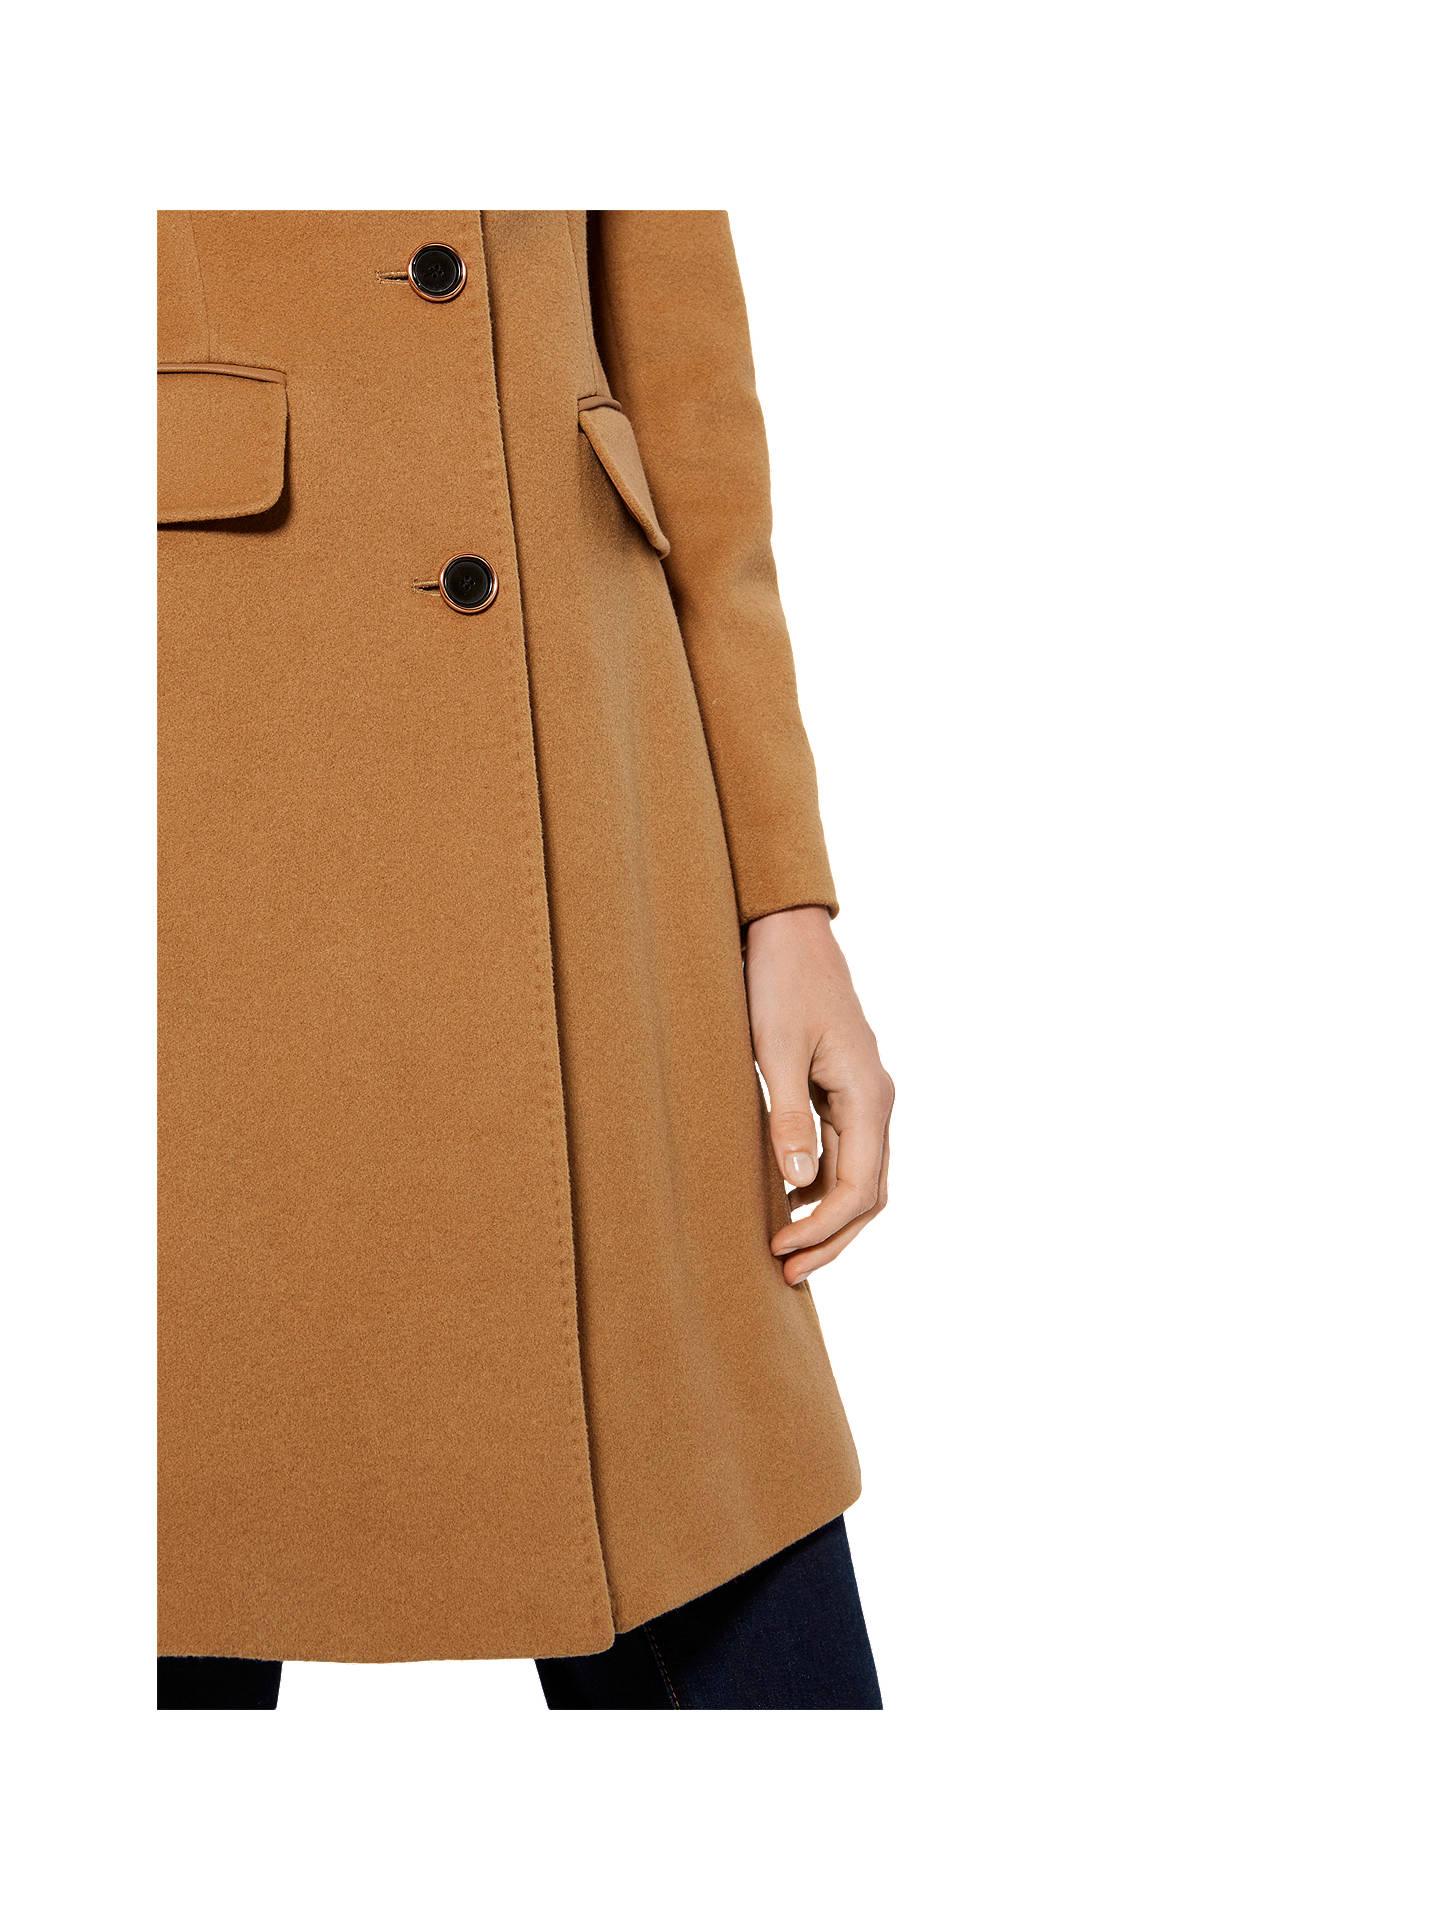 numerousinvariety how to get buying new Karen Millen Coat, Camel at John Lewis & Partners